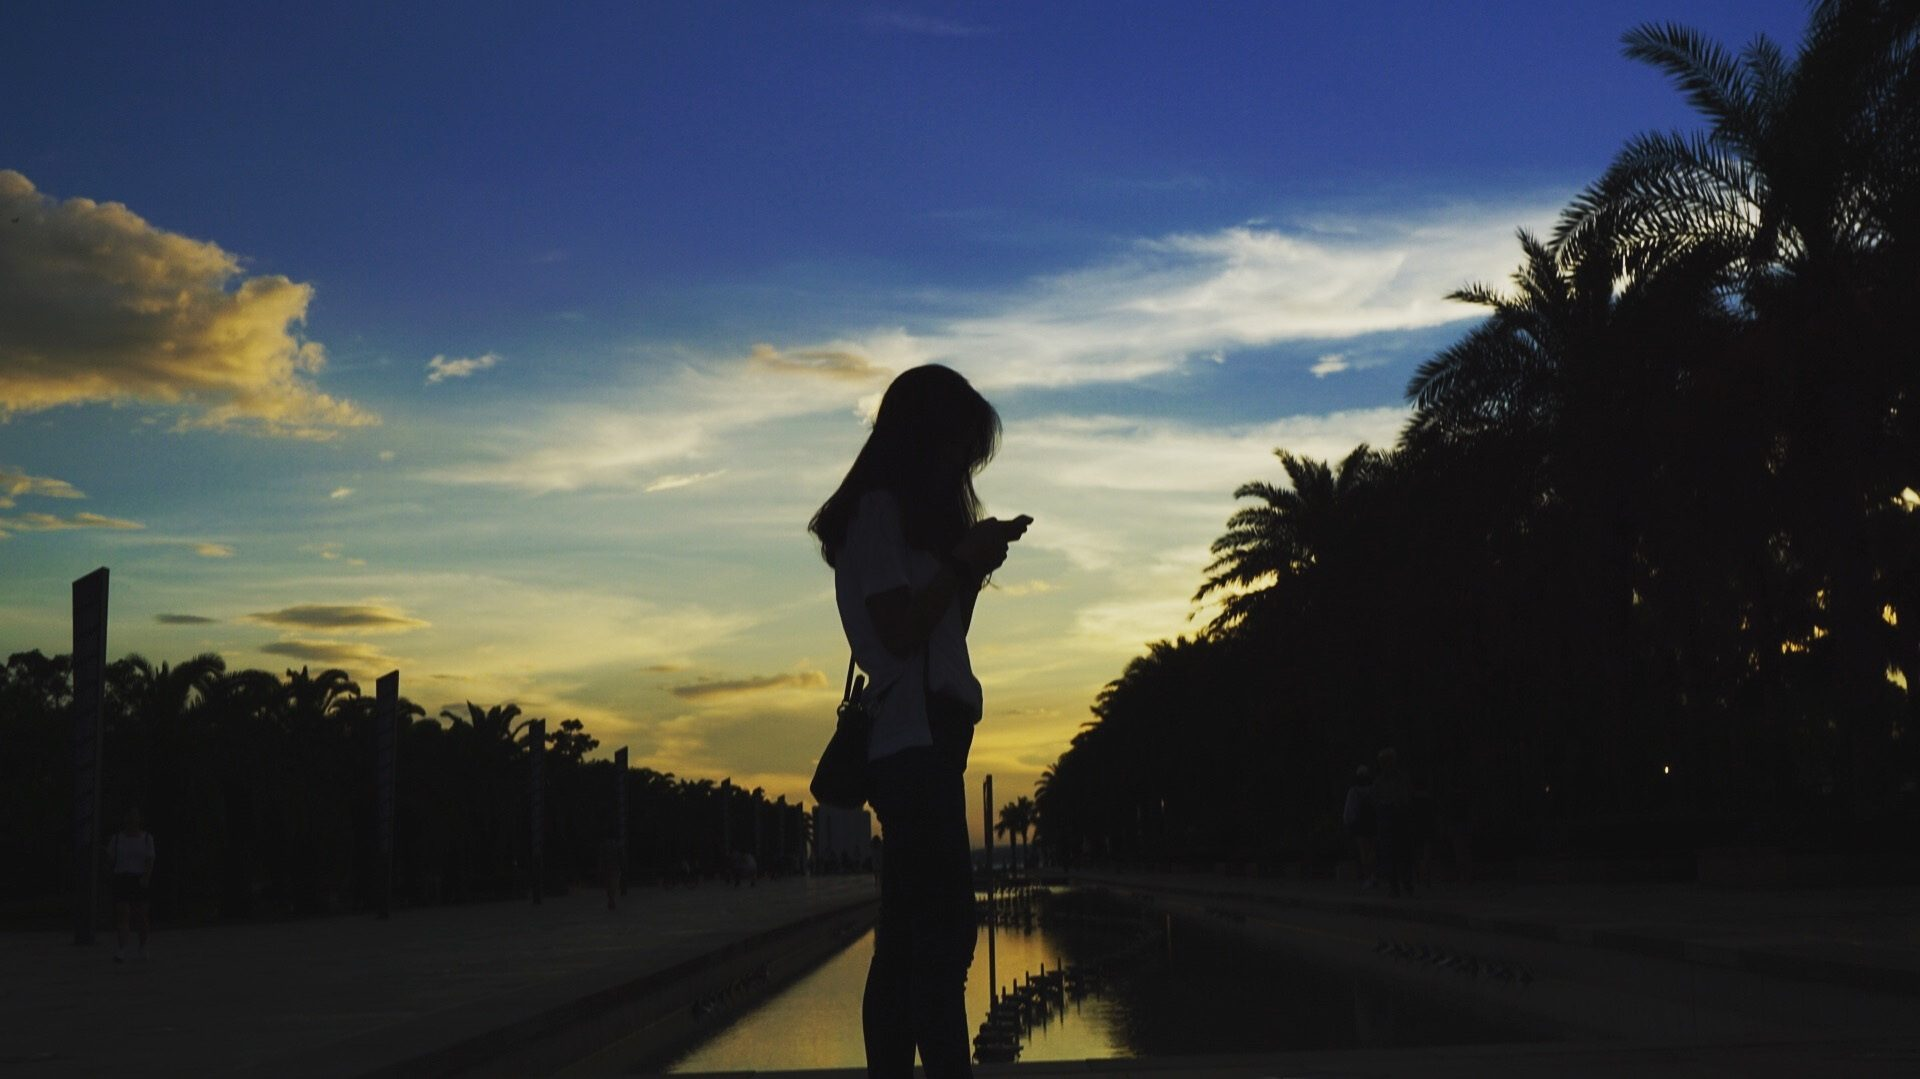 mujer, silueta, playa, atardecer, sombras - Fondos de Pantalla HD - professor-falken.com